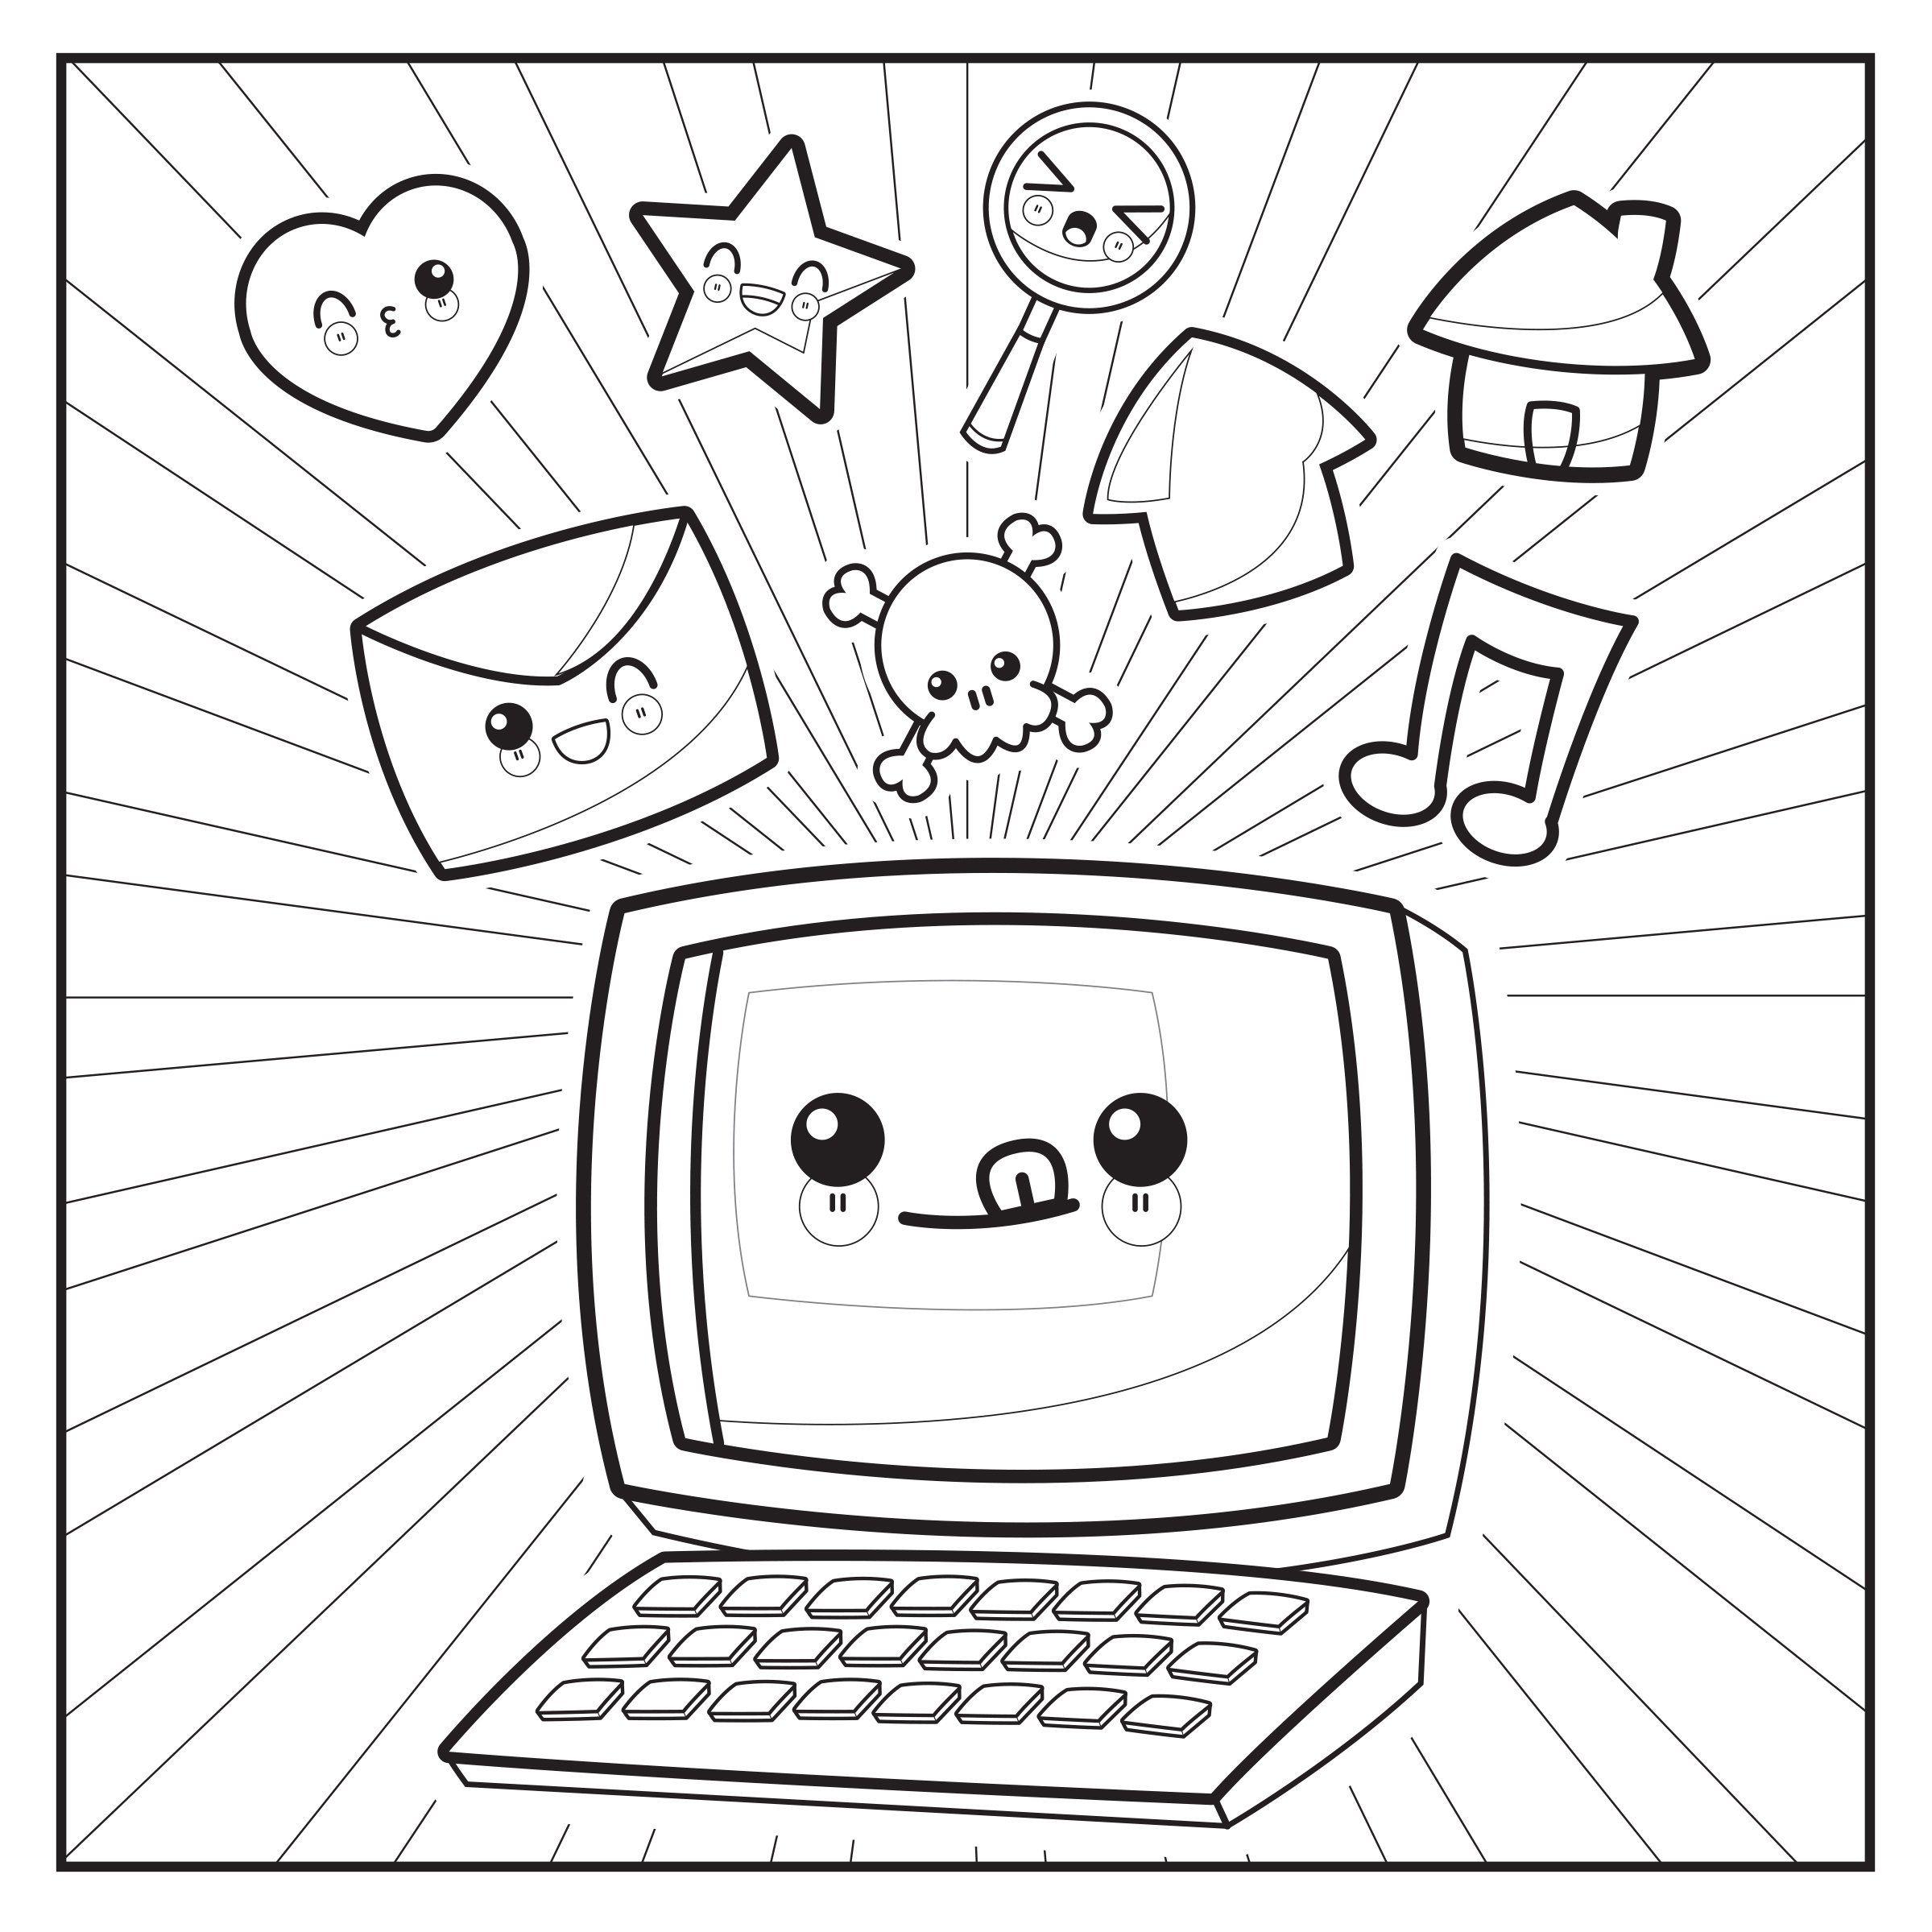 Amazon.com: Emoji Crazy Coloring Book 48 Cute, Fun Pages: For ...